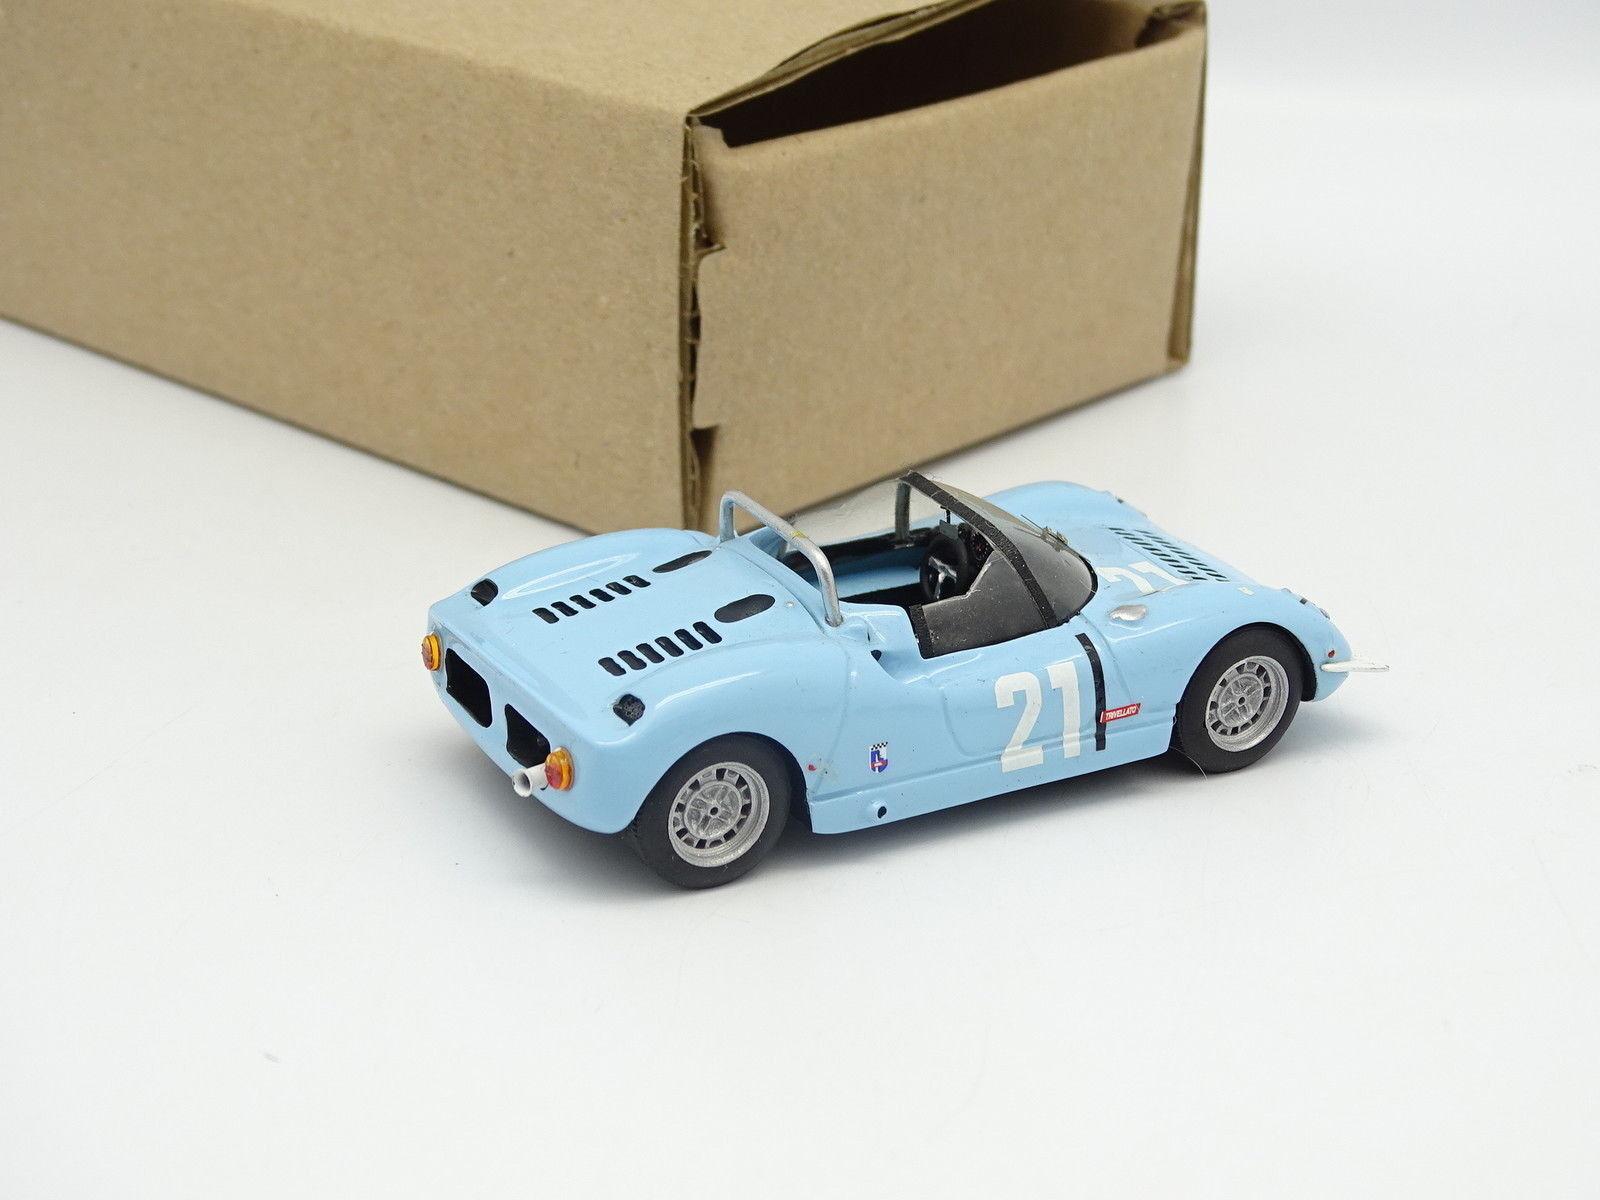 Car Stift Modelle Set aufgebaut SB 1 43 Fiat ABARTH ABARTH ABARTH 1000 SP RACING IMOLA 1968 ee2e56